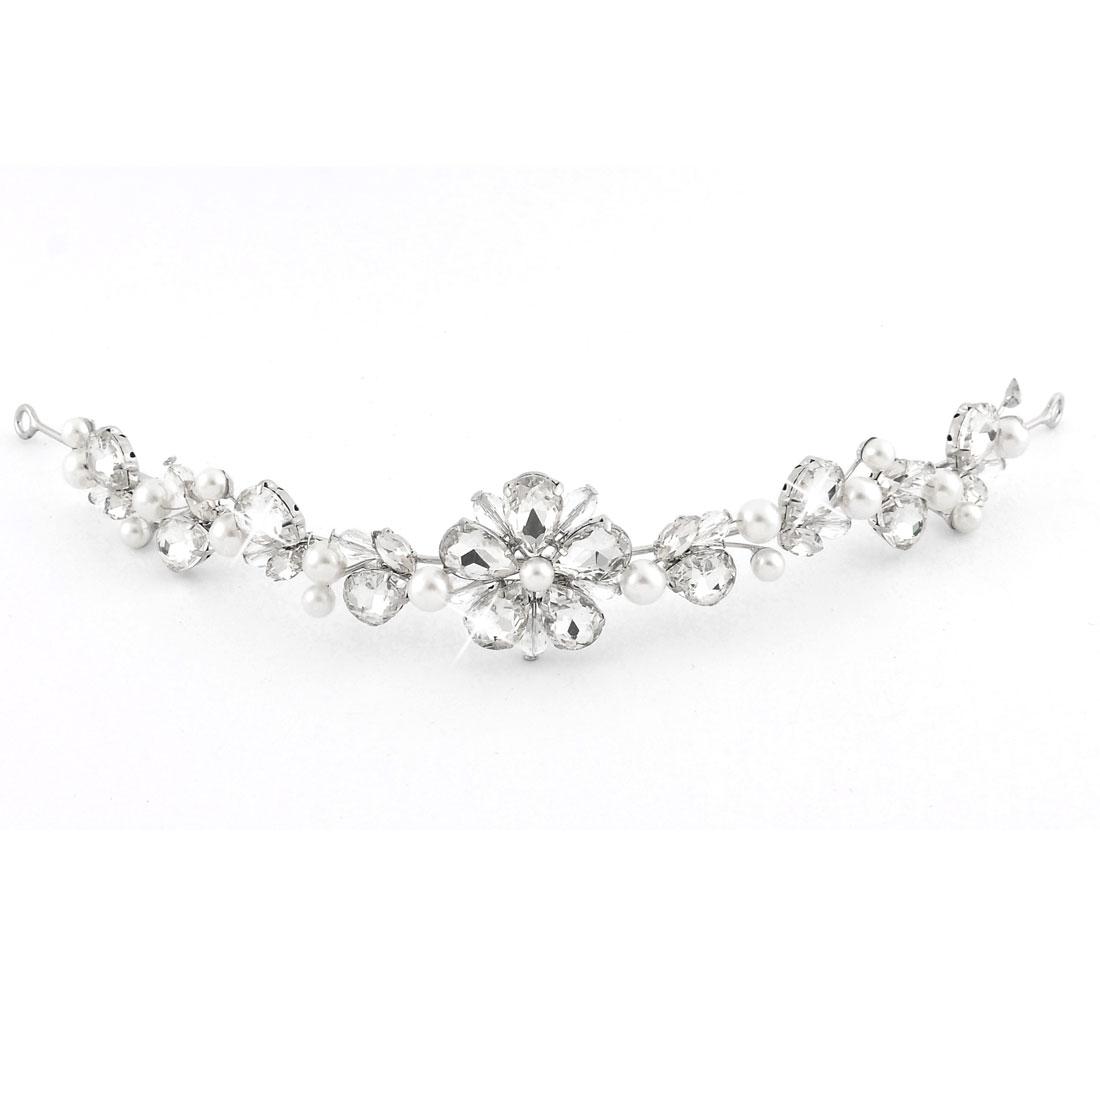 Wedding Bride Imitation Pearl Rhinestone Inlaid Hairband Headpiece Headband Hair Accessory